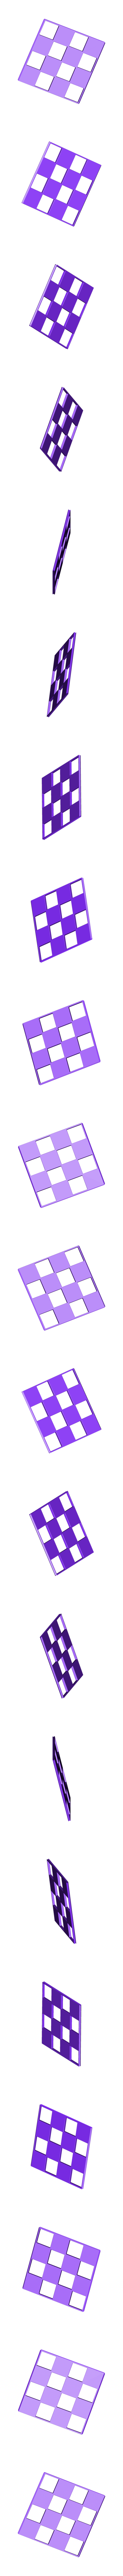 Game Board.stl Download free STL file Game Board • 3D printable object, 3DBuilder